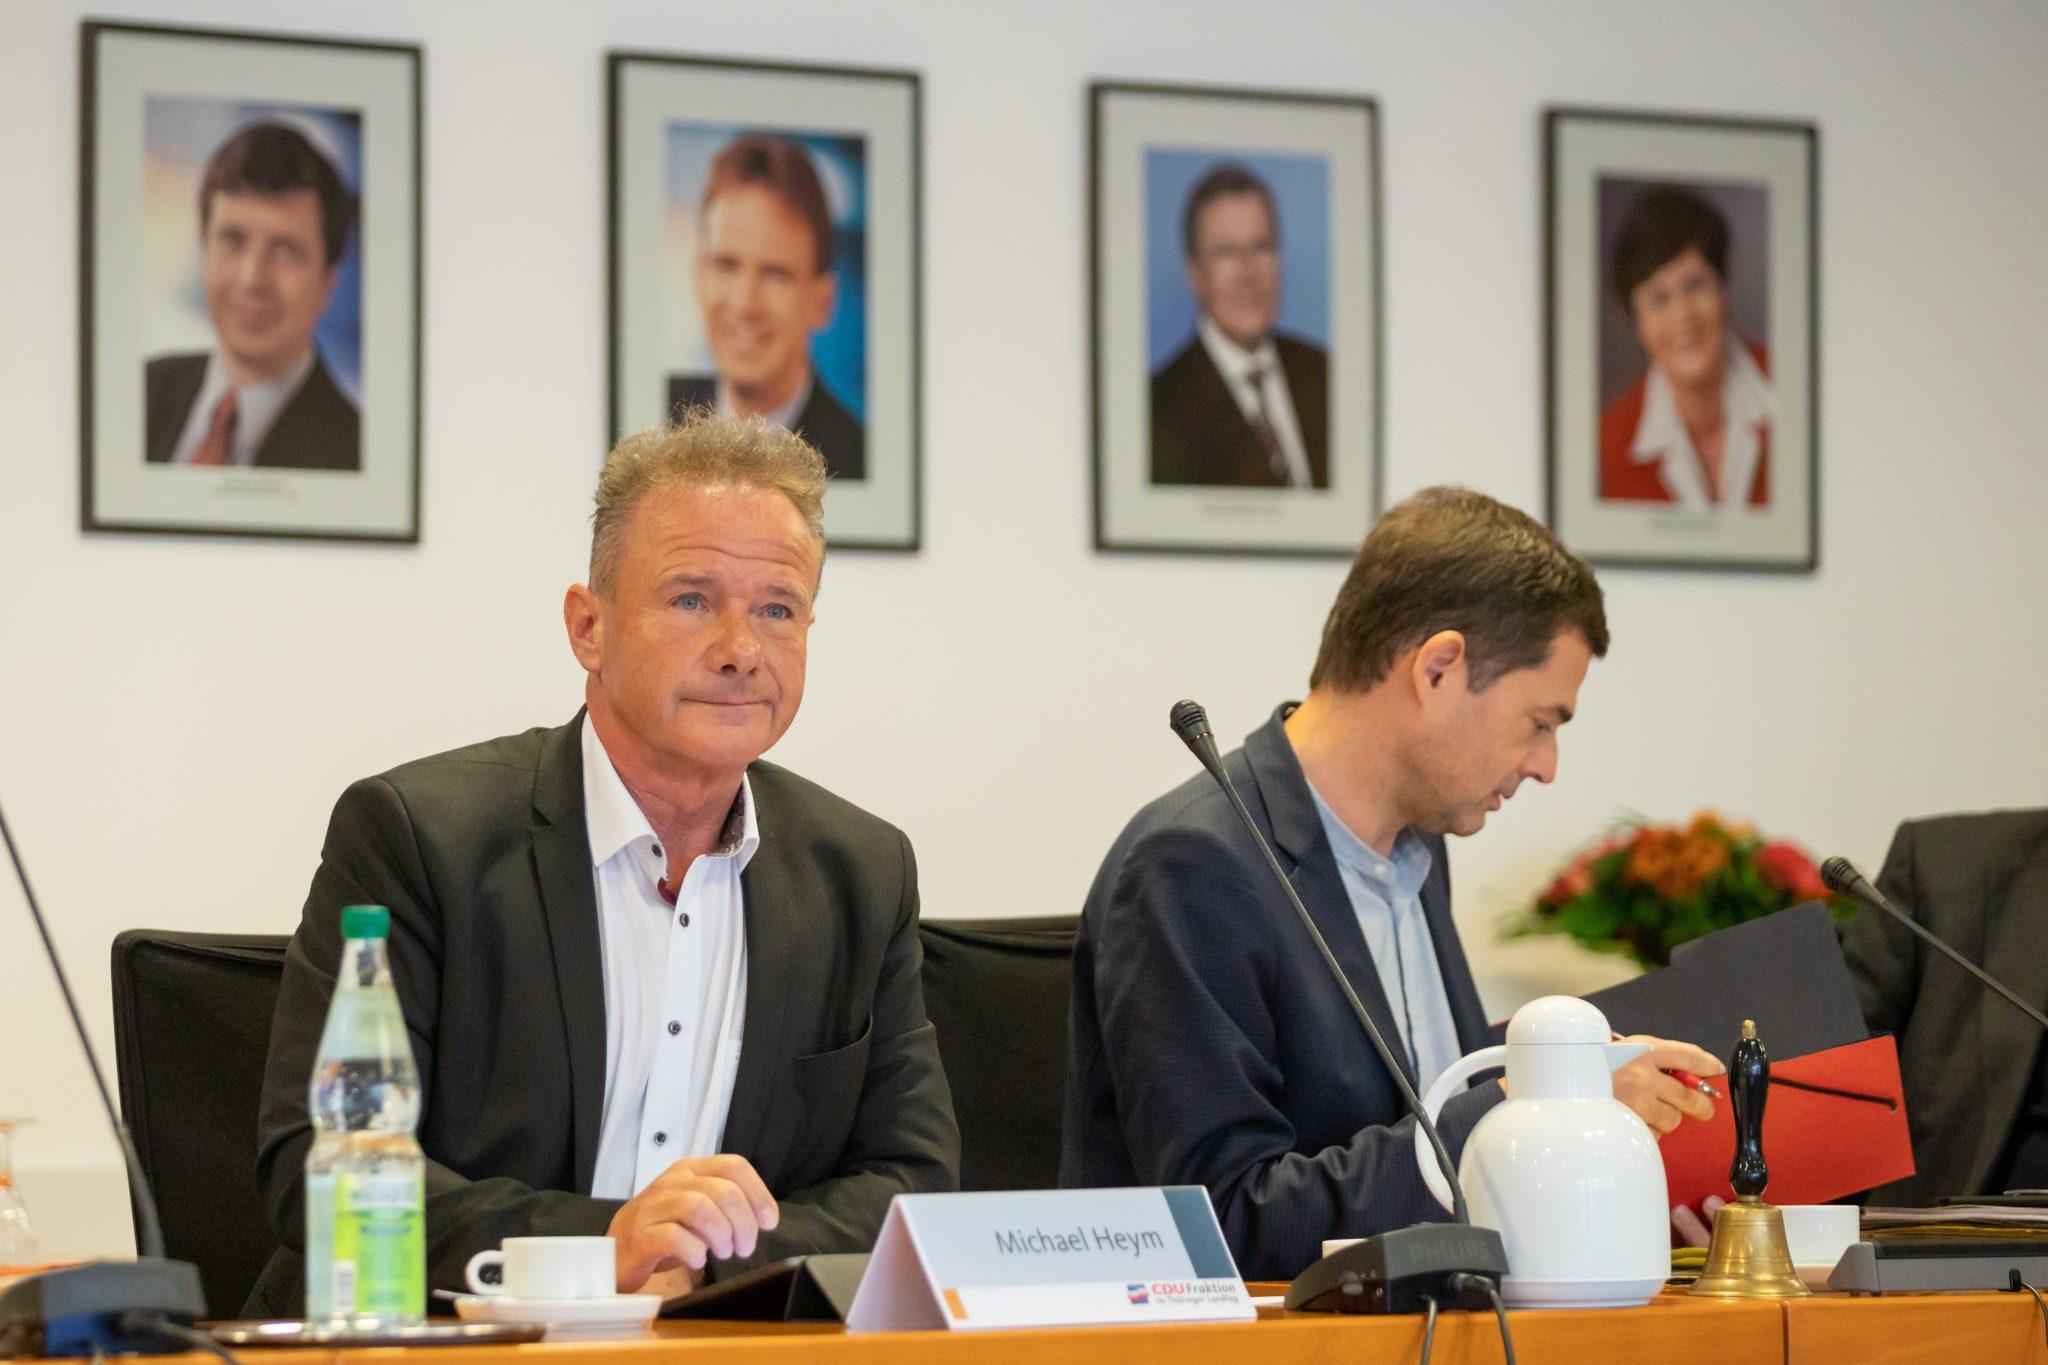 Konstituierende Sitzung der CDU-Landtagsfraktion